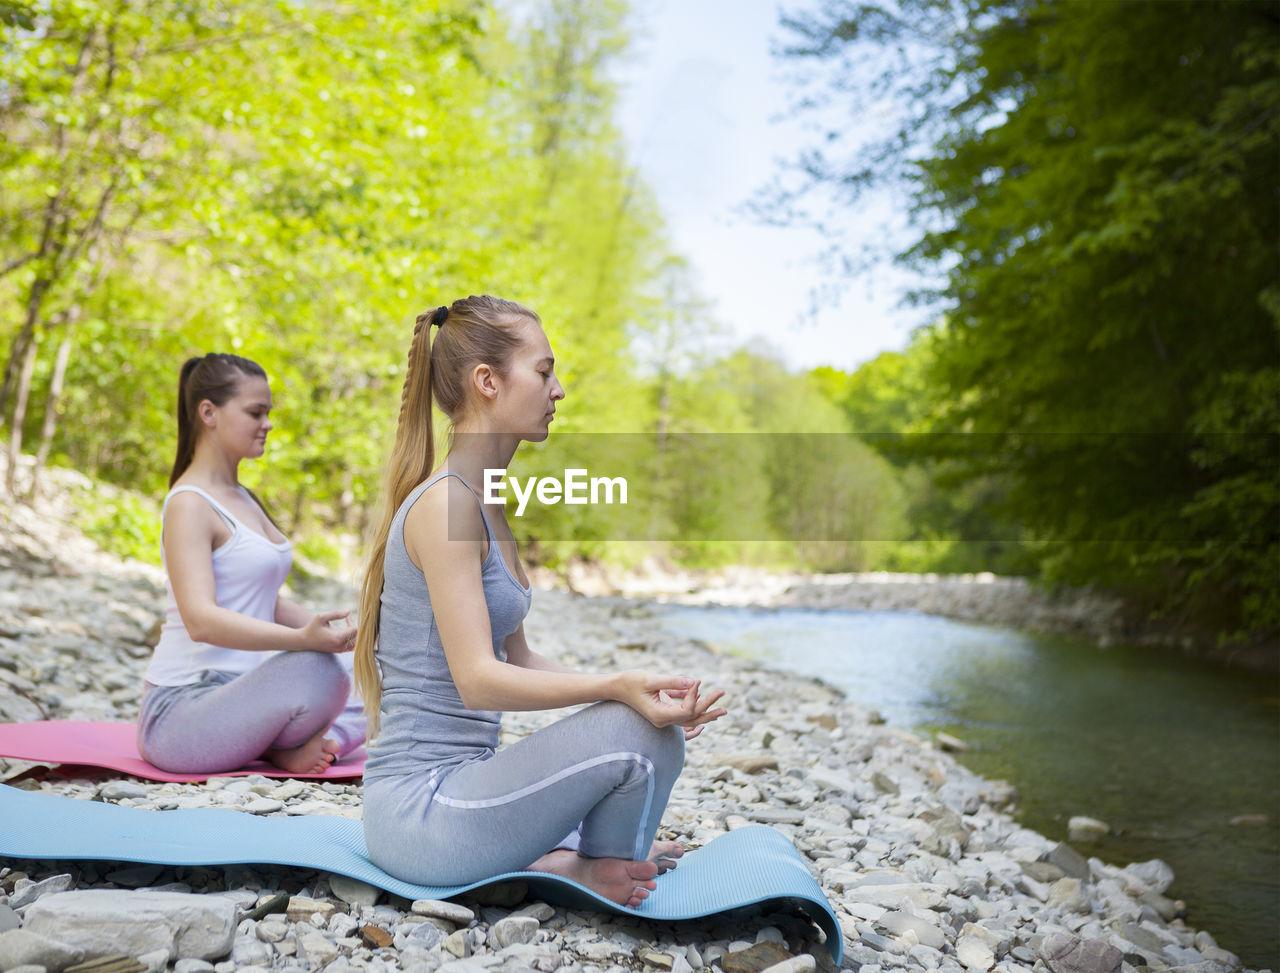 Women exercising near lake in forest